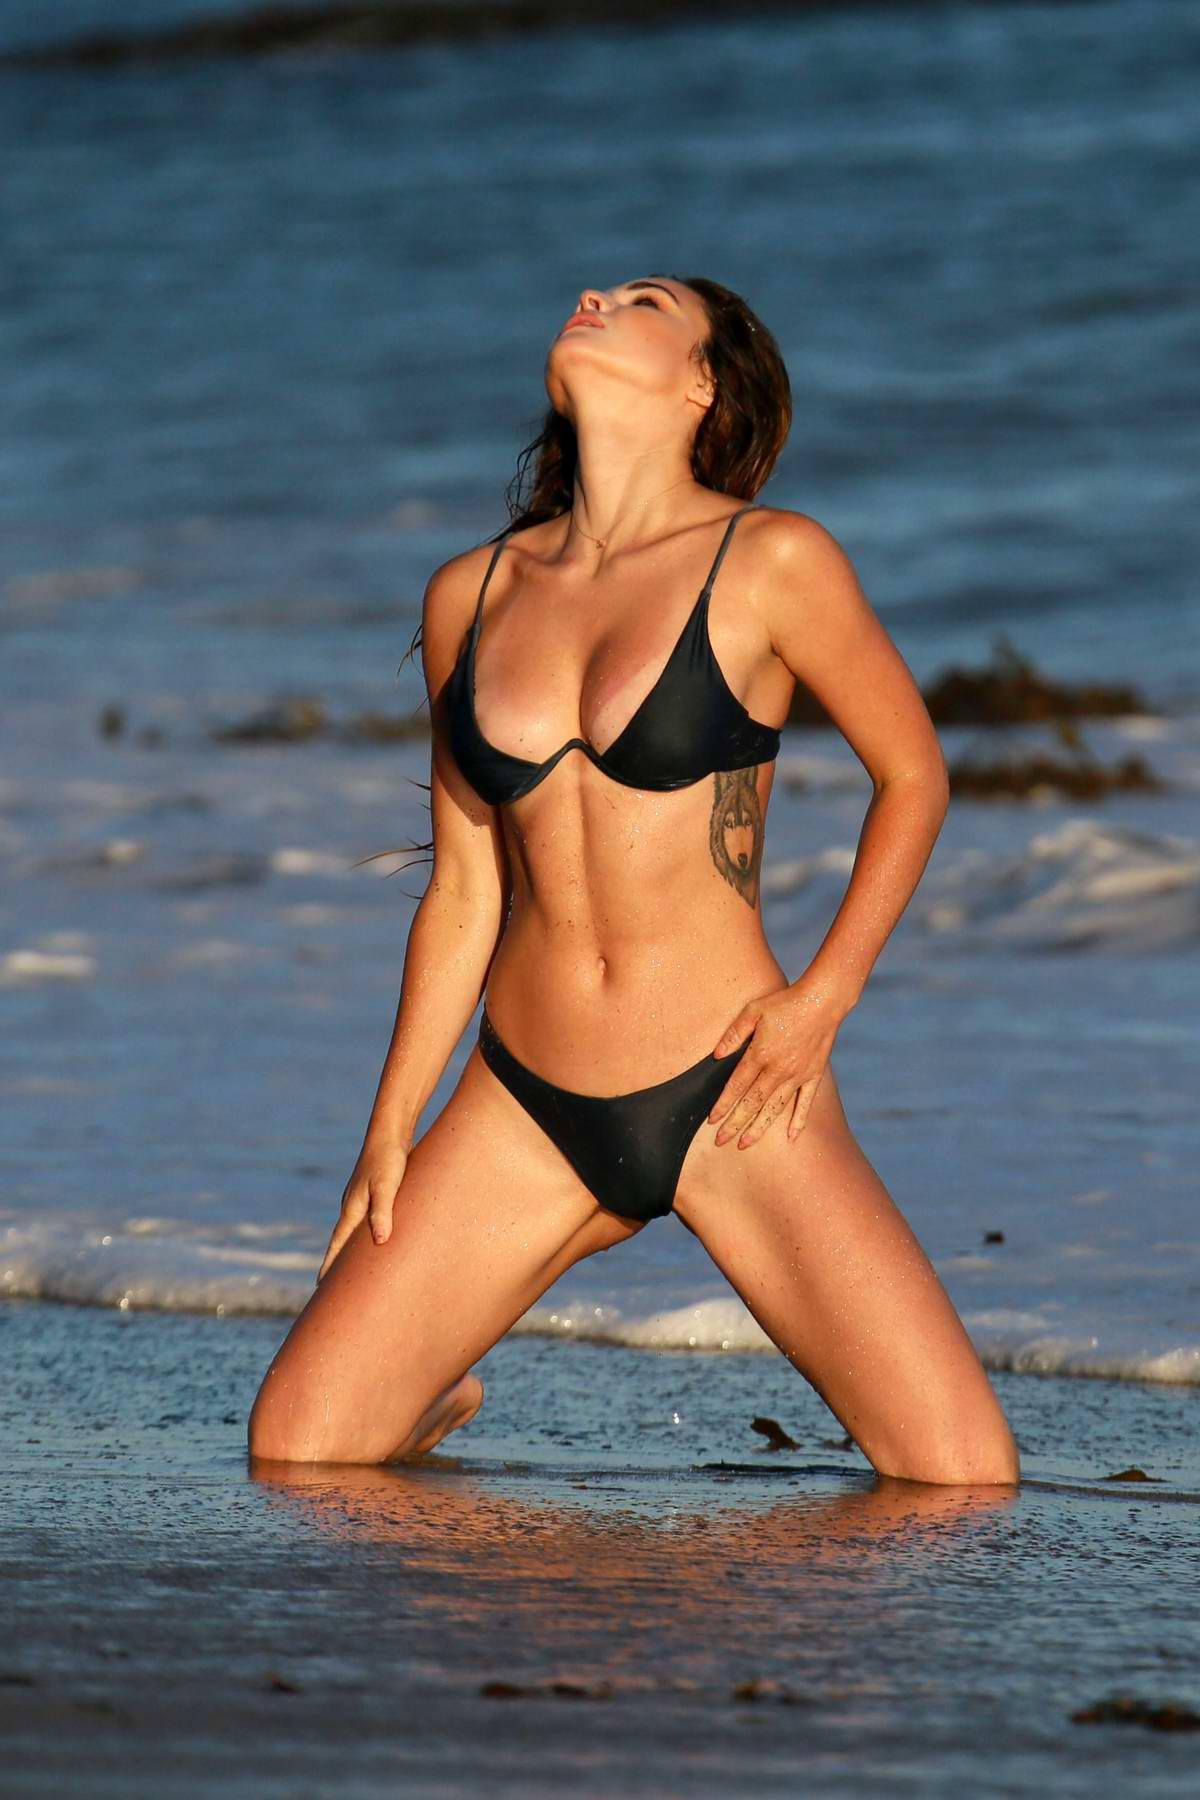 Mercedes South Charlotte >> kaili thorne poses in a bikini during beach photoshoot for ...